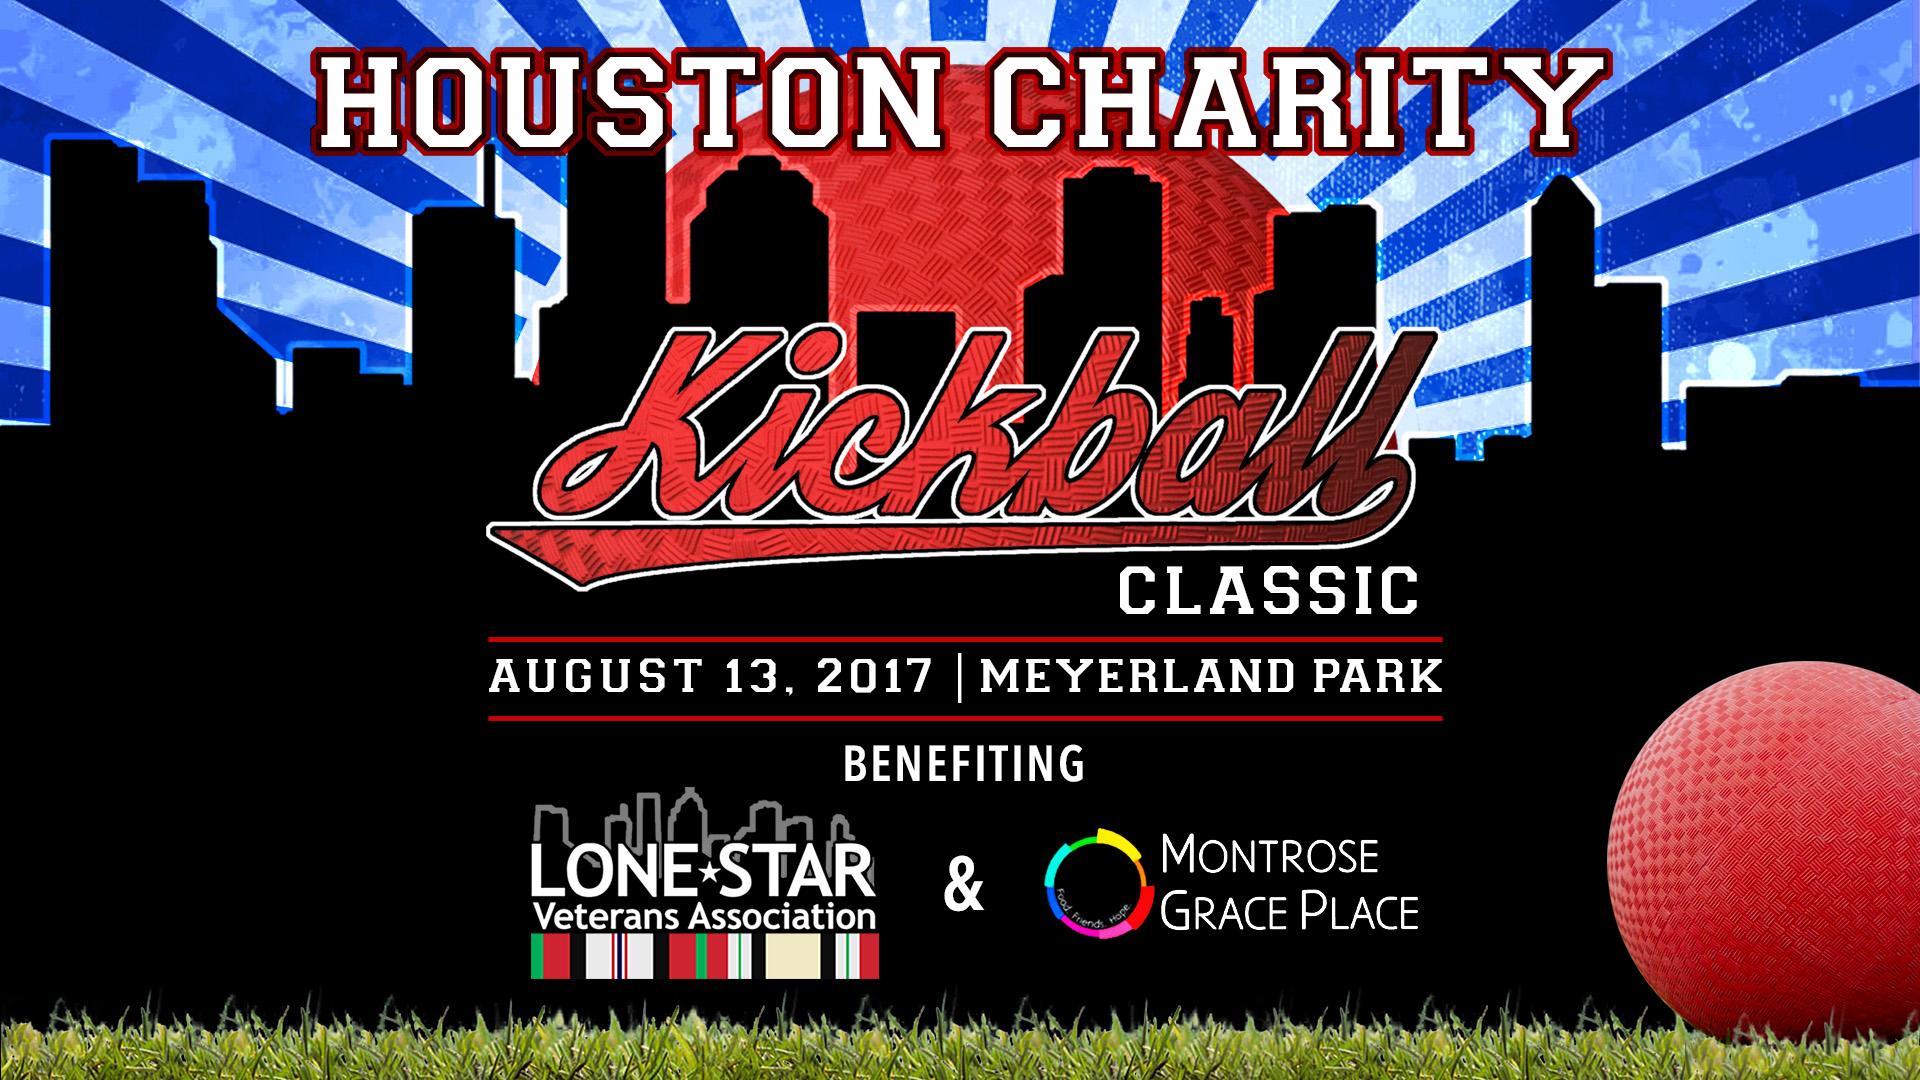 2017 Charity Kickball Classic